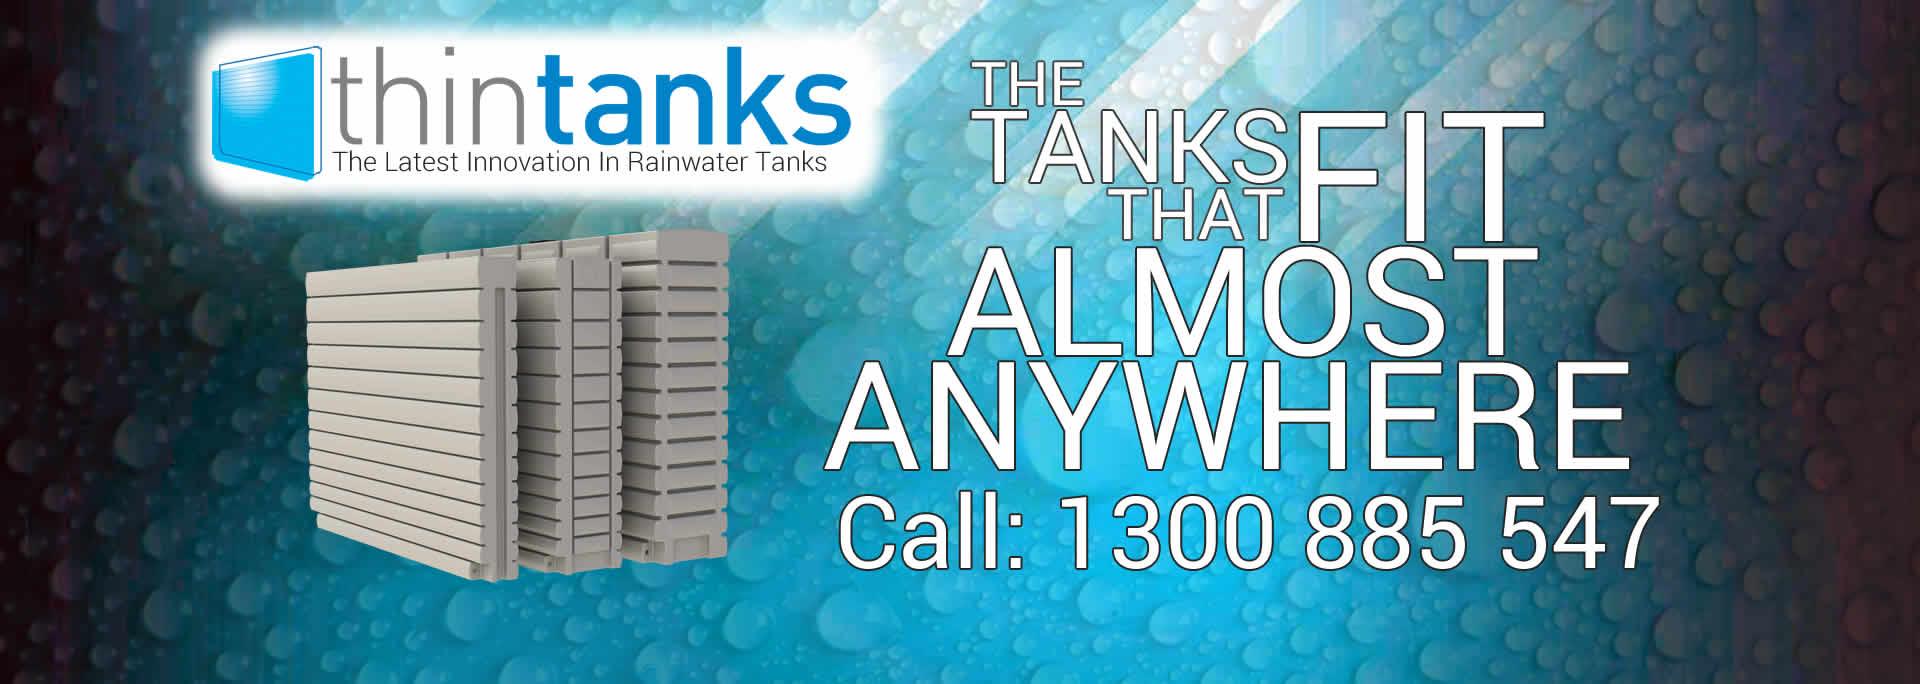 thintanks